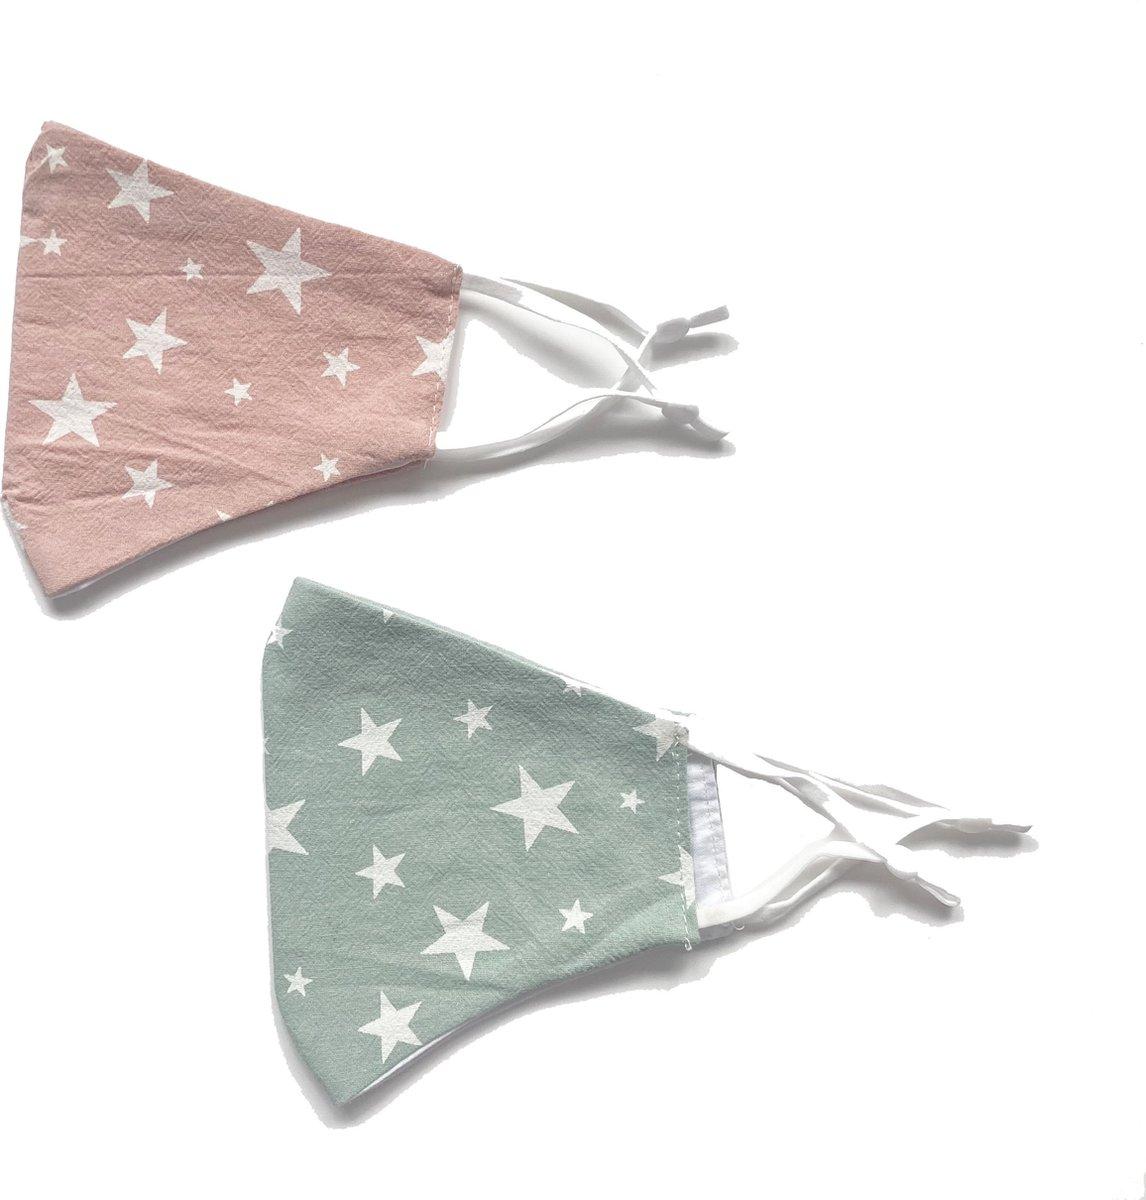 Mondkapjes - mondkapjes sterren - mondkapje sterrenprint - roze mondkapje - mondkapjes set - kerst mondkapjes --2 stuks mondkapjes - blauw mondkapje - gekleurd mondkapje - wasbaar mondkapje - verstelbaar mondkapje